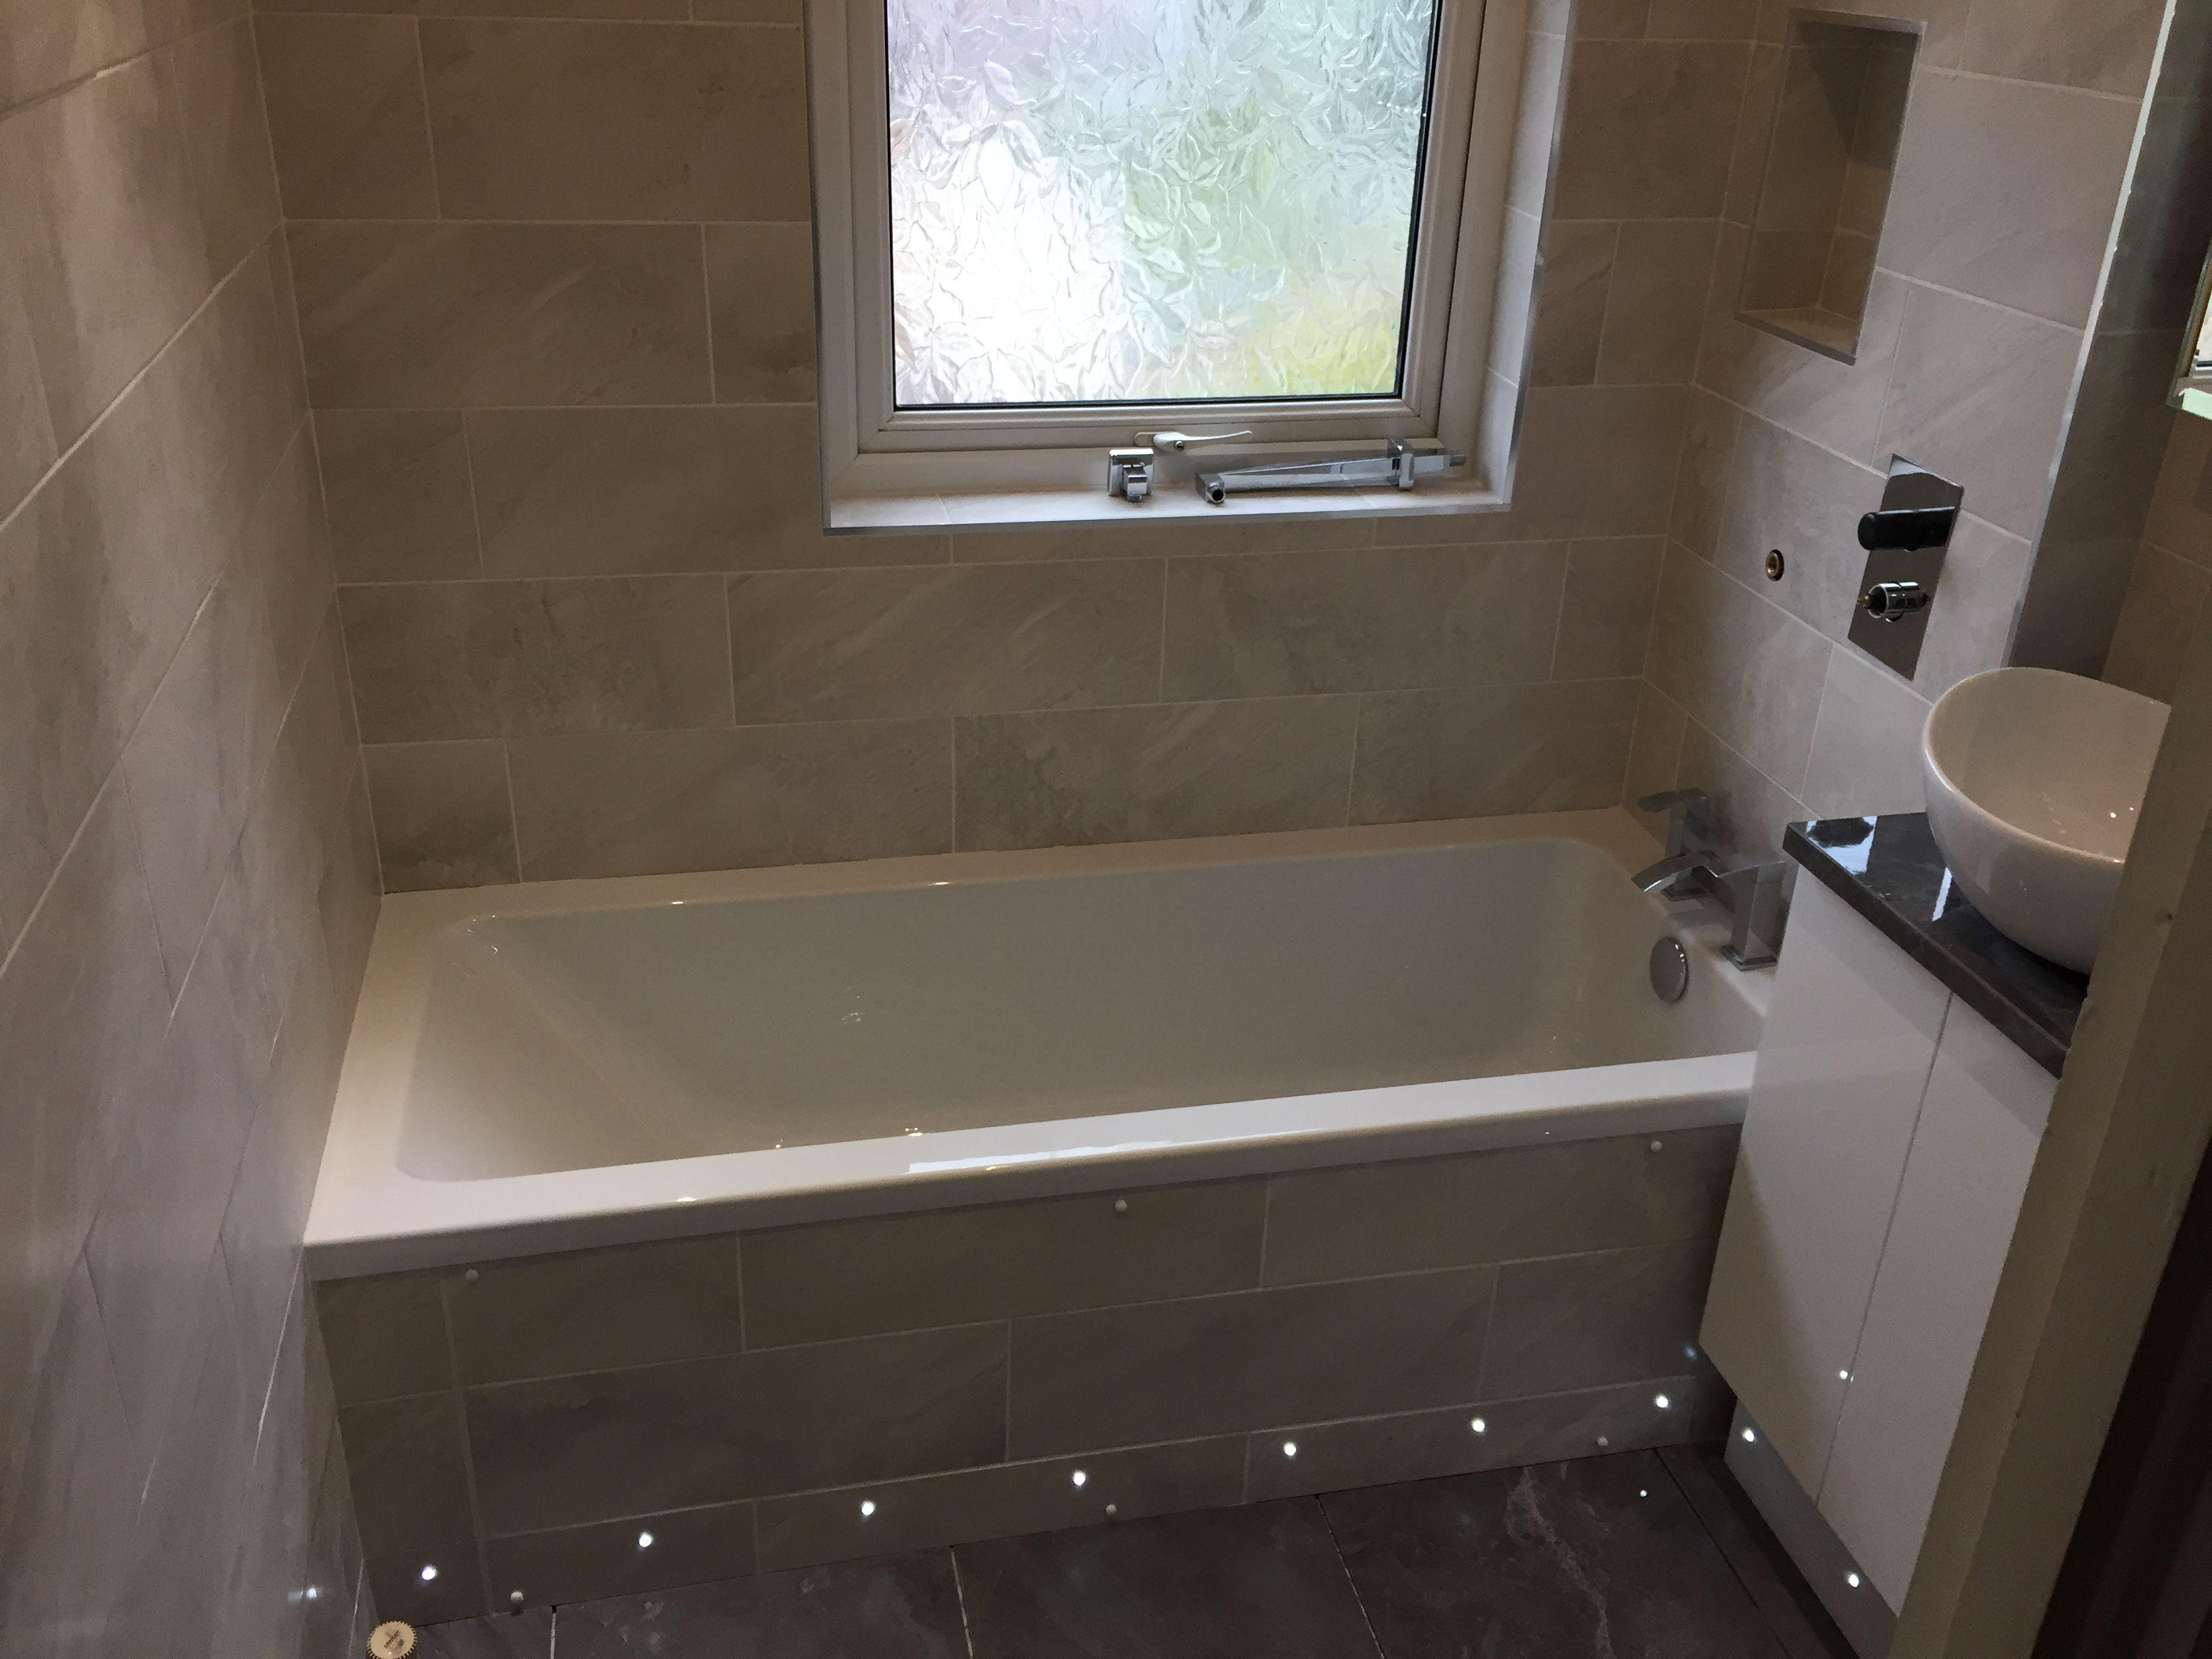 Image result for tiled semi inset counter Tiled bath